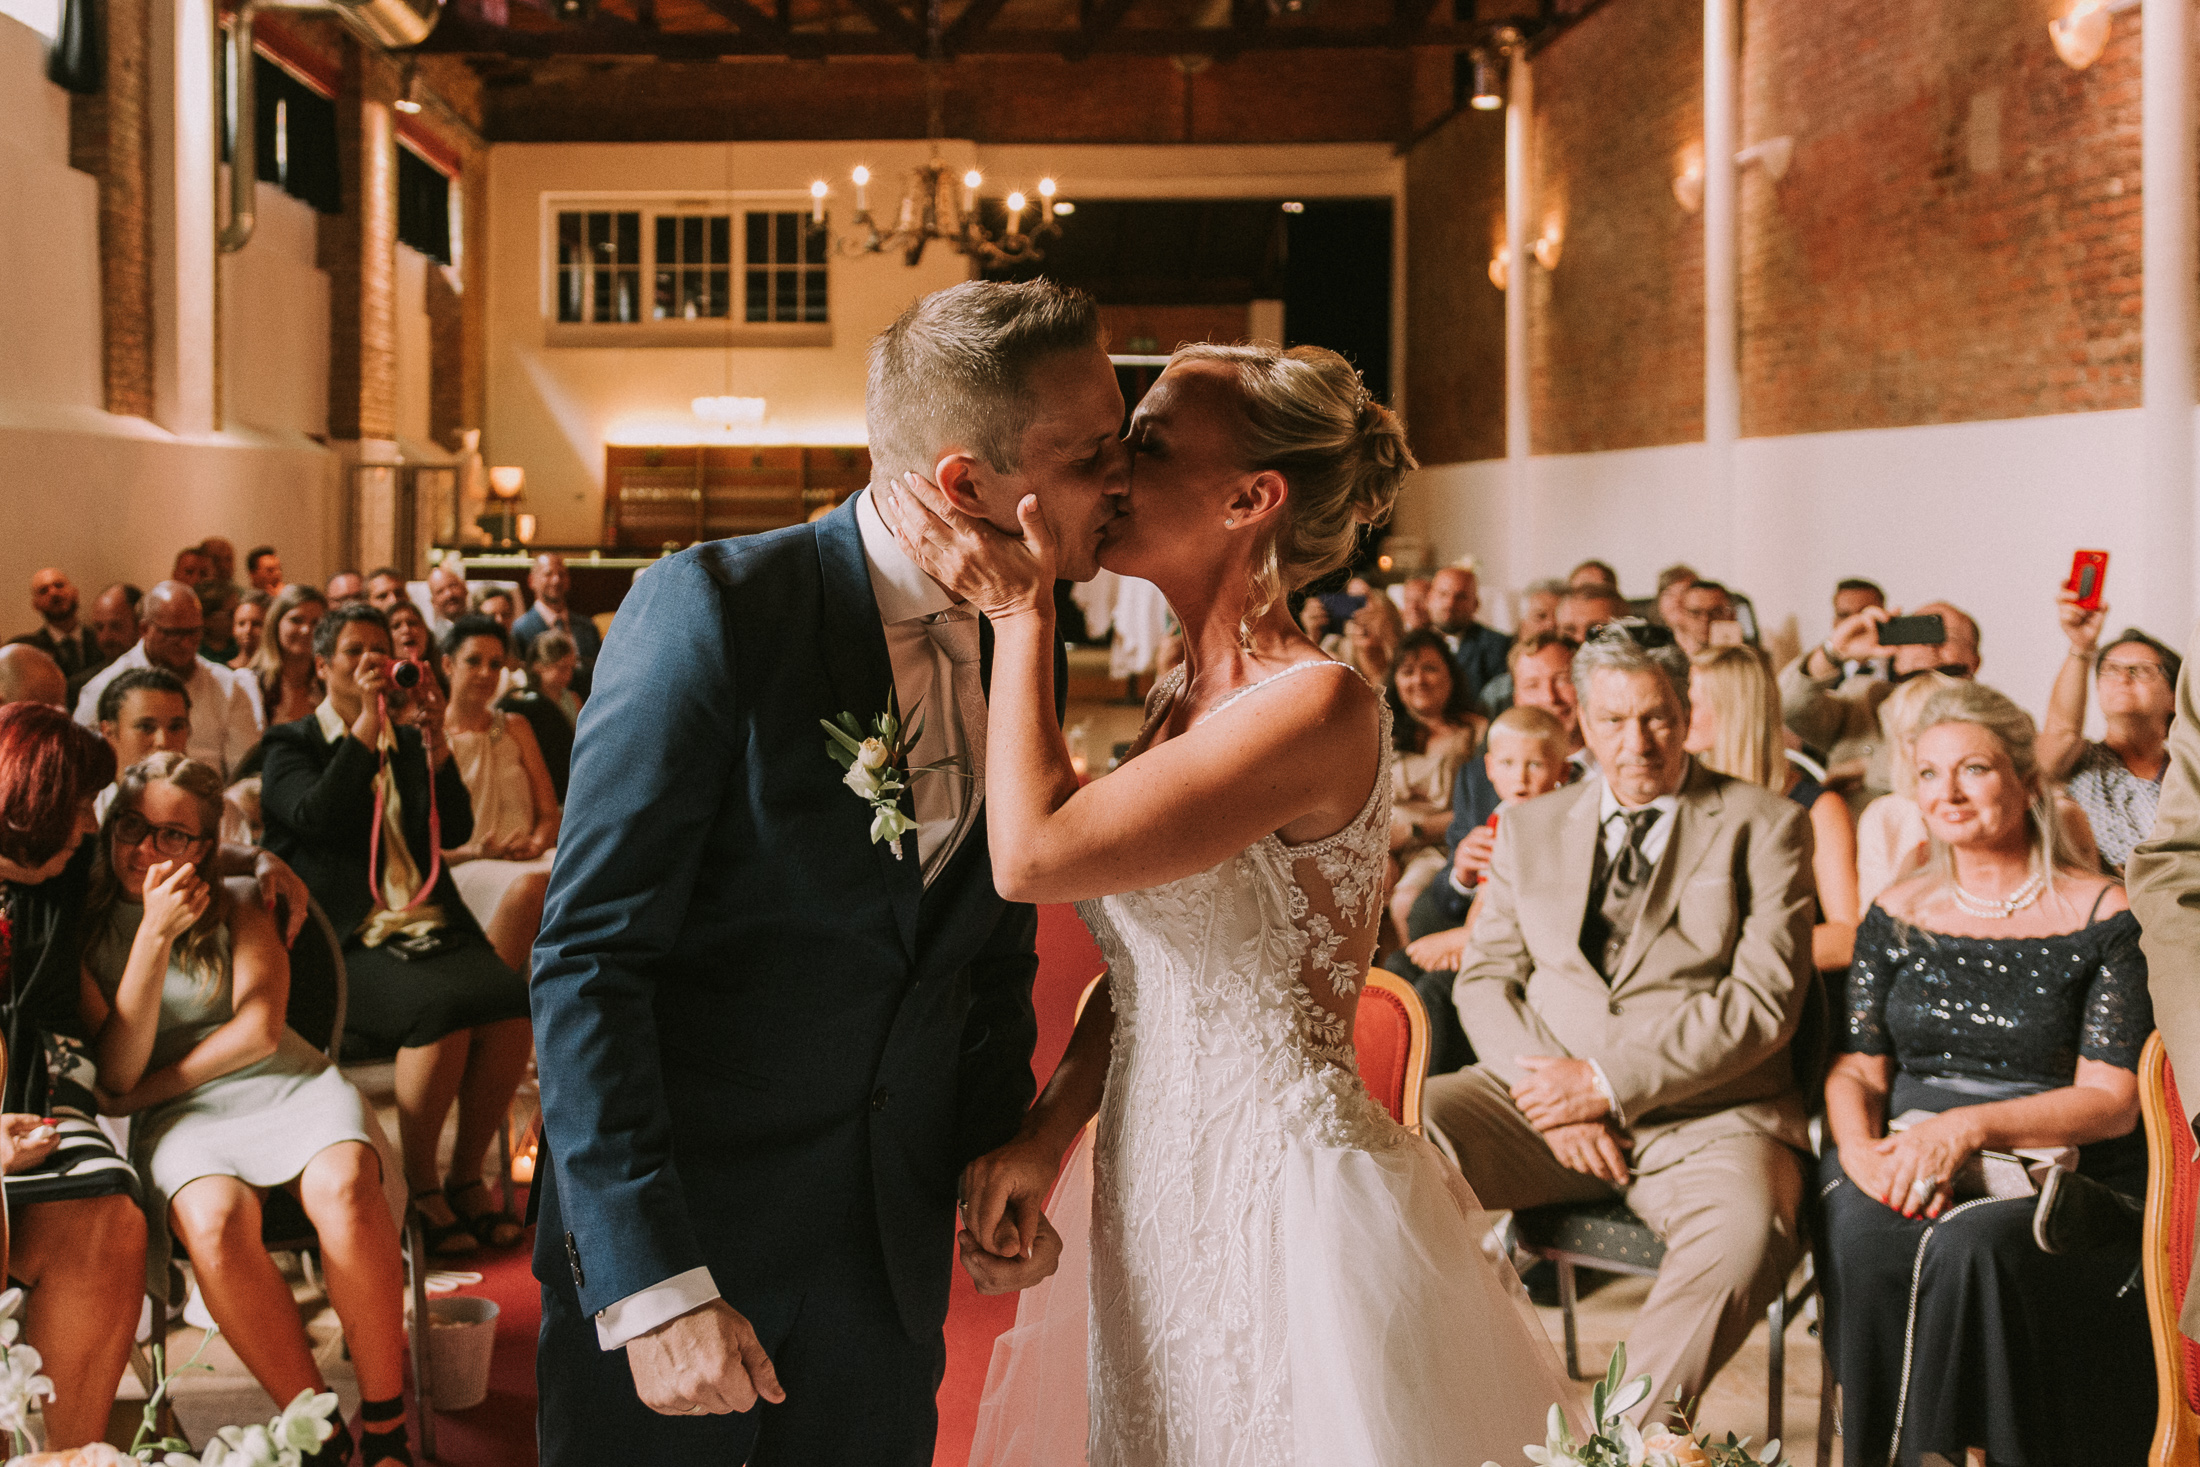 SebastianDon-Hochzeitsfotograf-Wien Umgebung-15.jpg